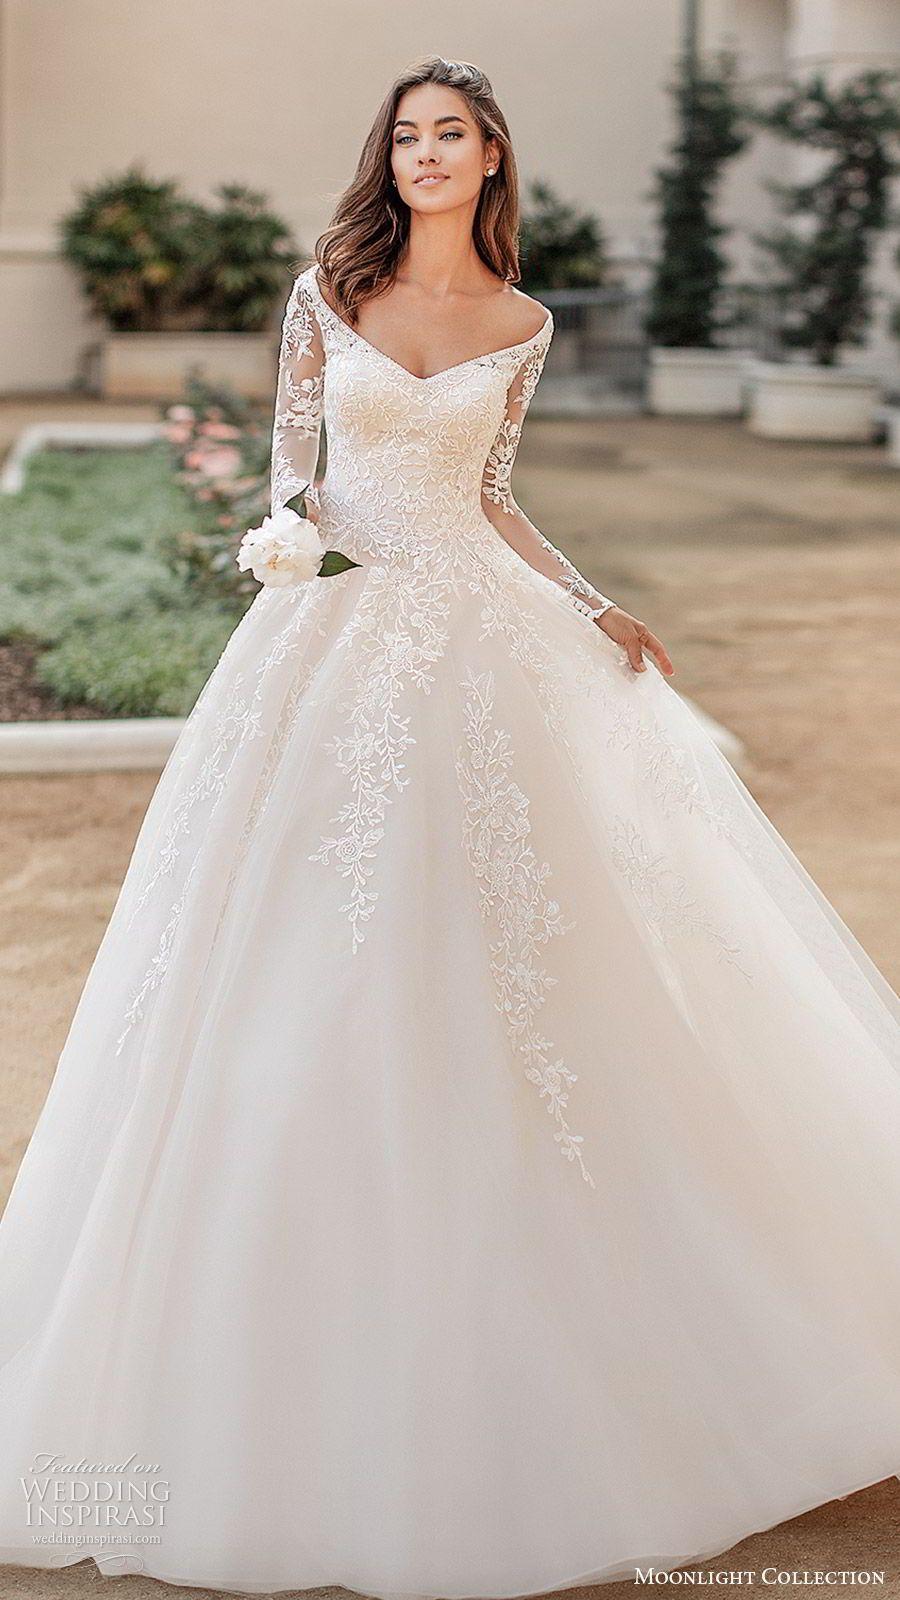 Moonlight Collection Fall 2019 Wedding Dresses Wedding Inspirasi Ball Gowns Wedding Princess Wedding Dresses Wedding Dress Long Sleeve [ jpg ]